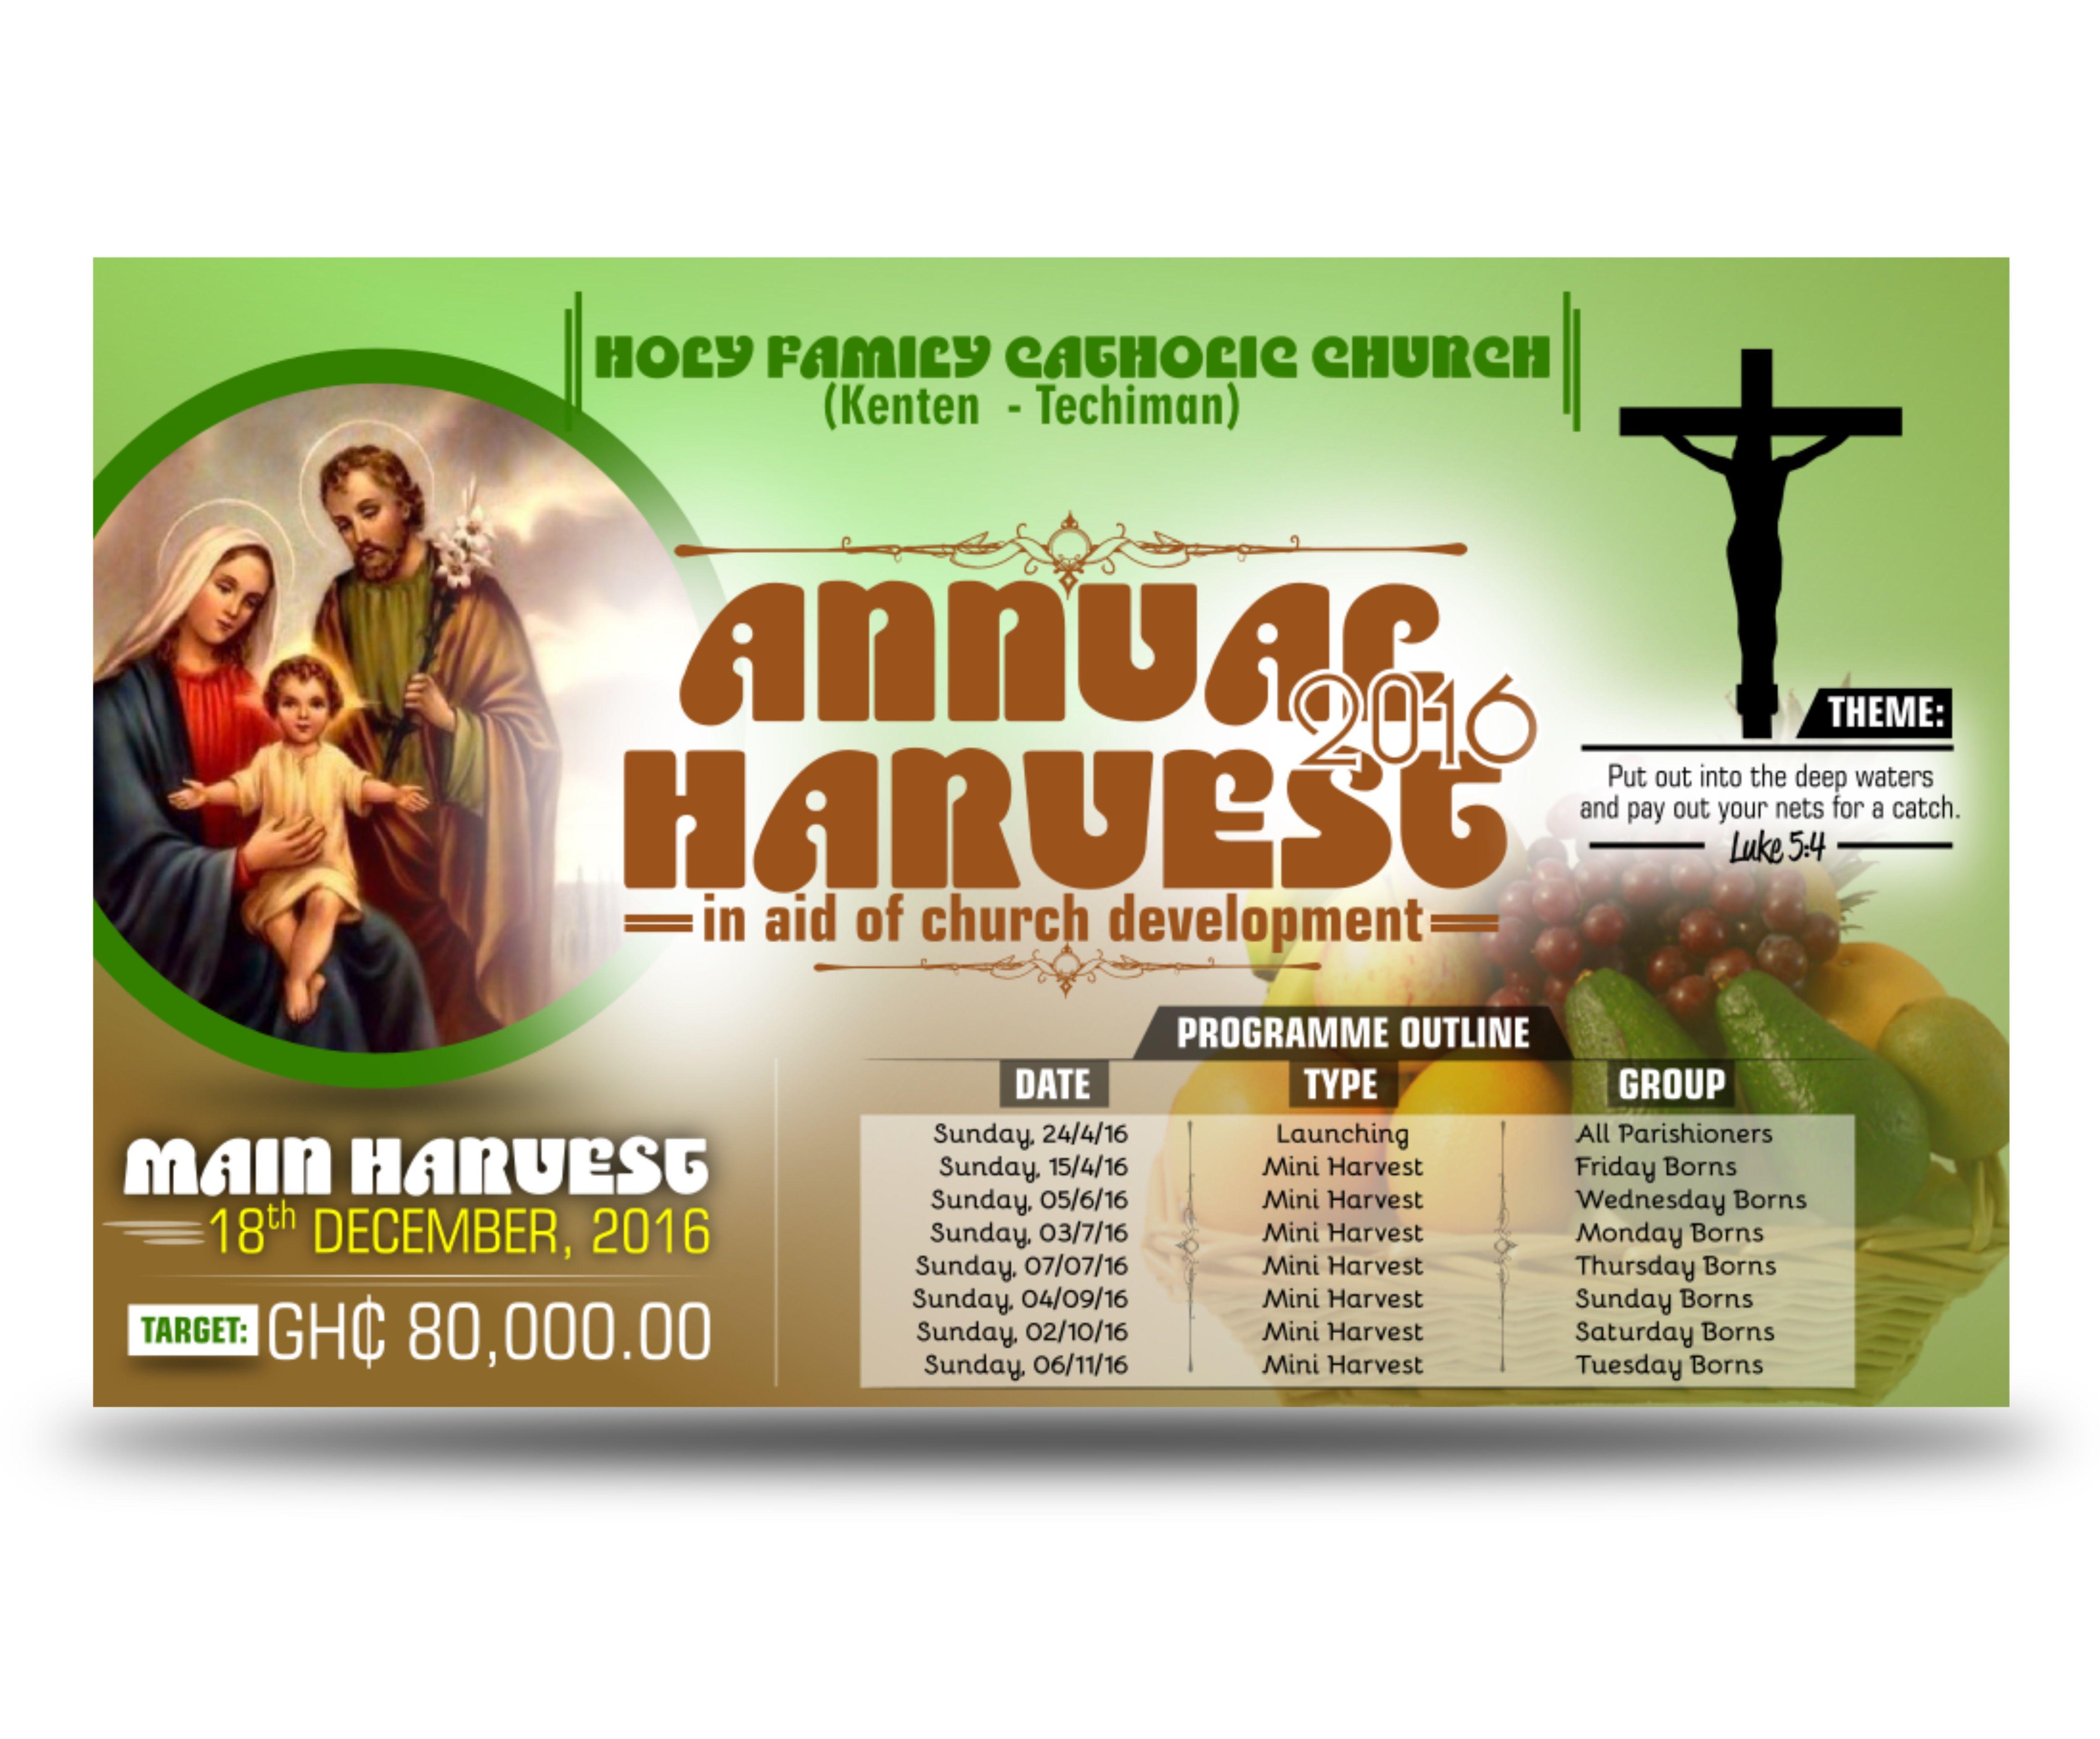 holy family catholic church kenten_techiman annual harvest large